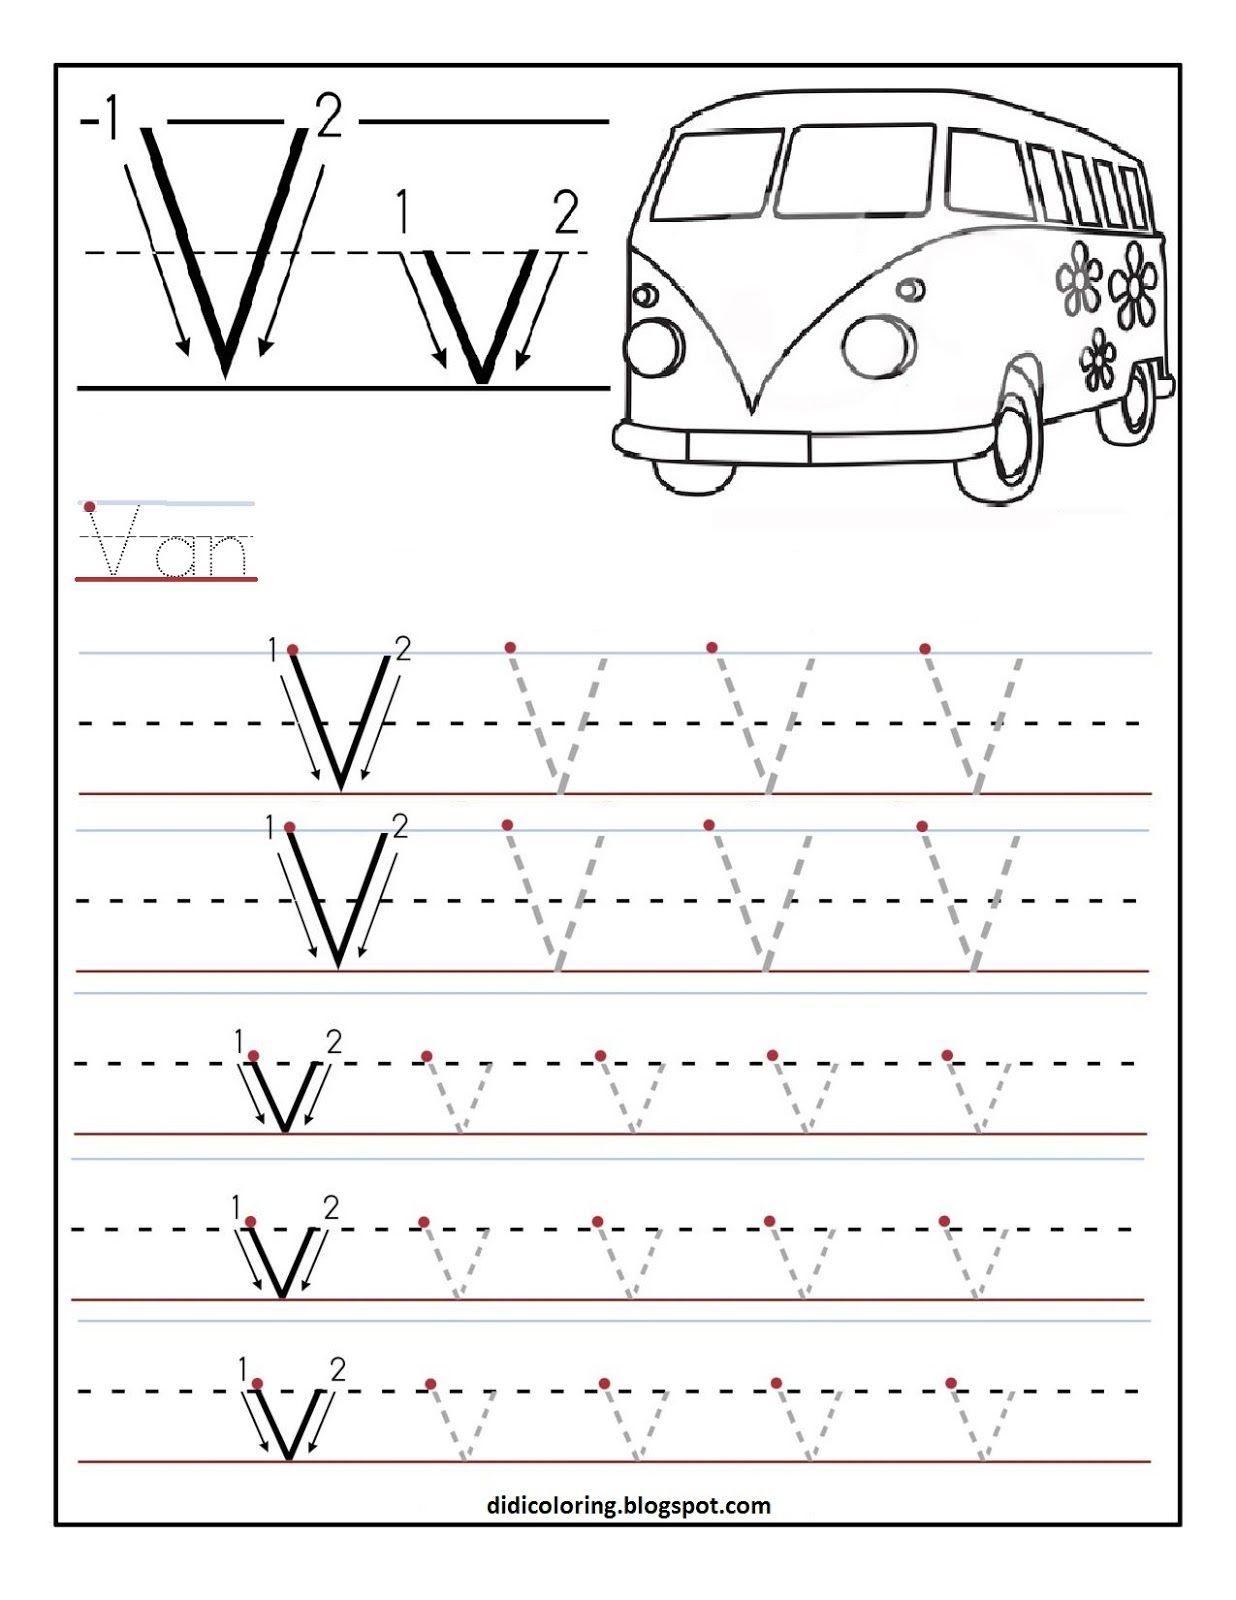 Free Printable Worksheet Letter V For Your Child To Learn for Letter V Worksheets Free Printables